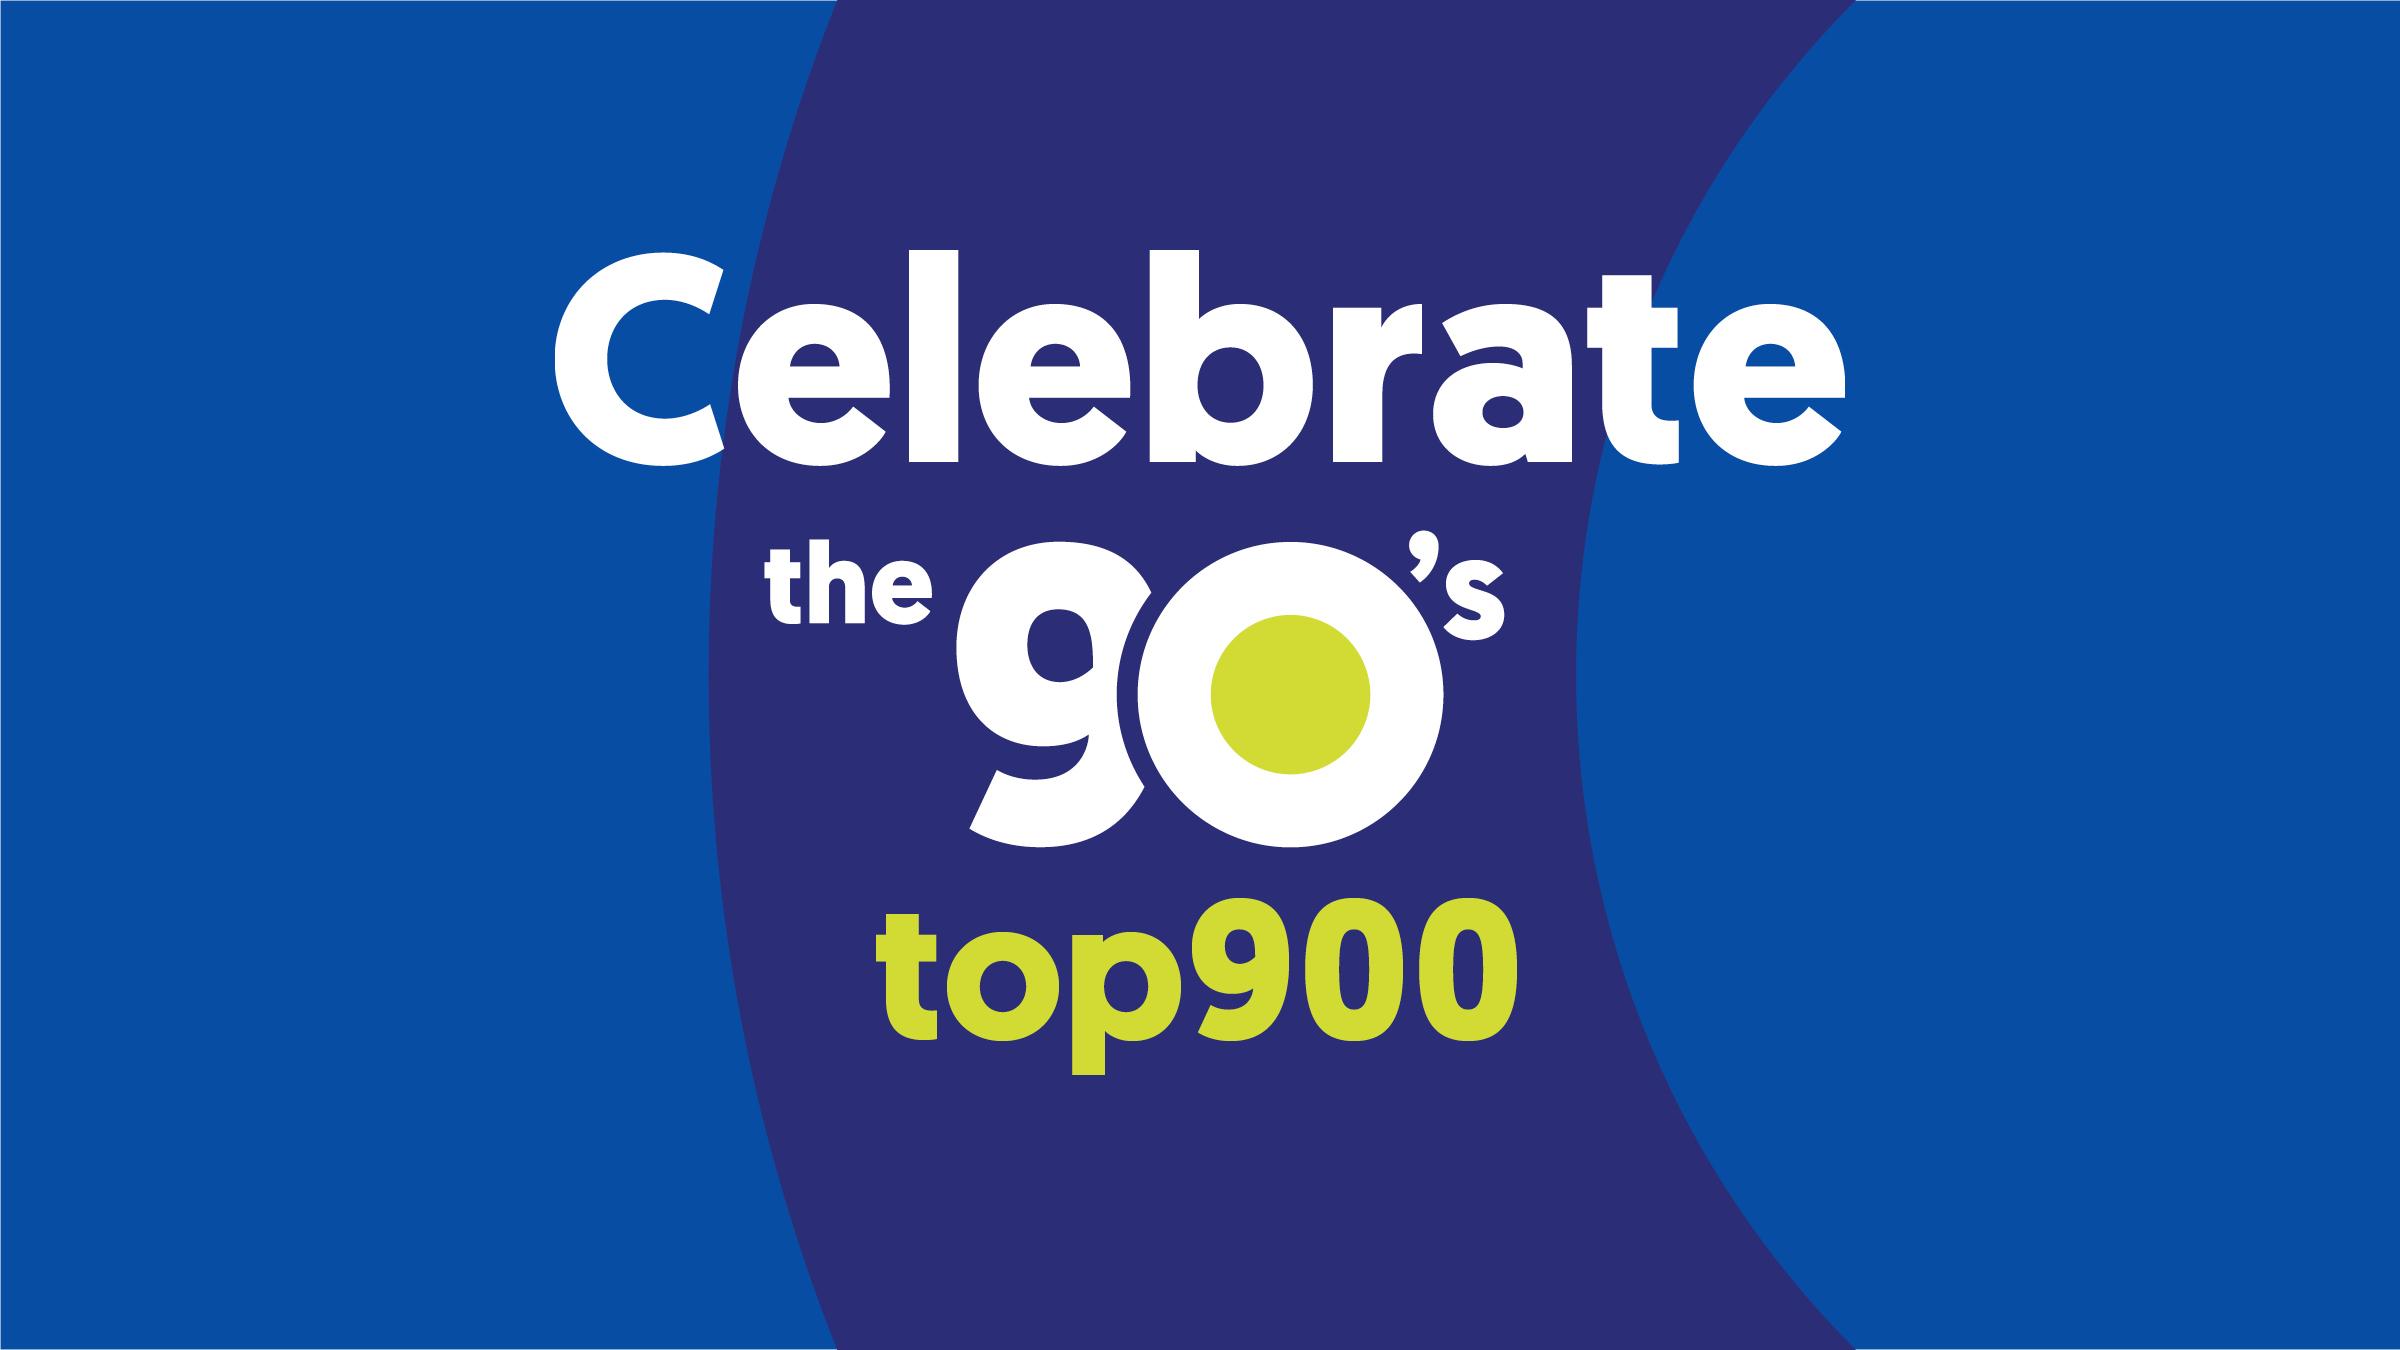 Headers celebrate the 90 s